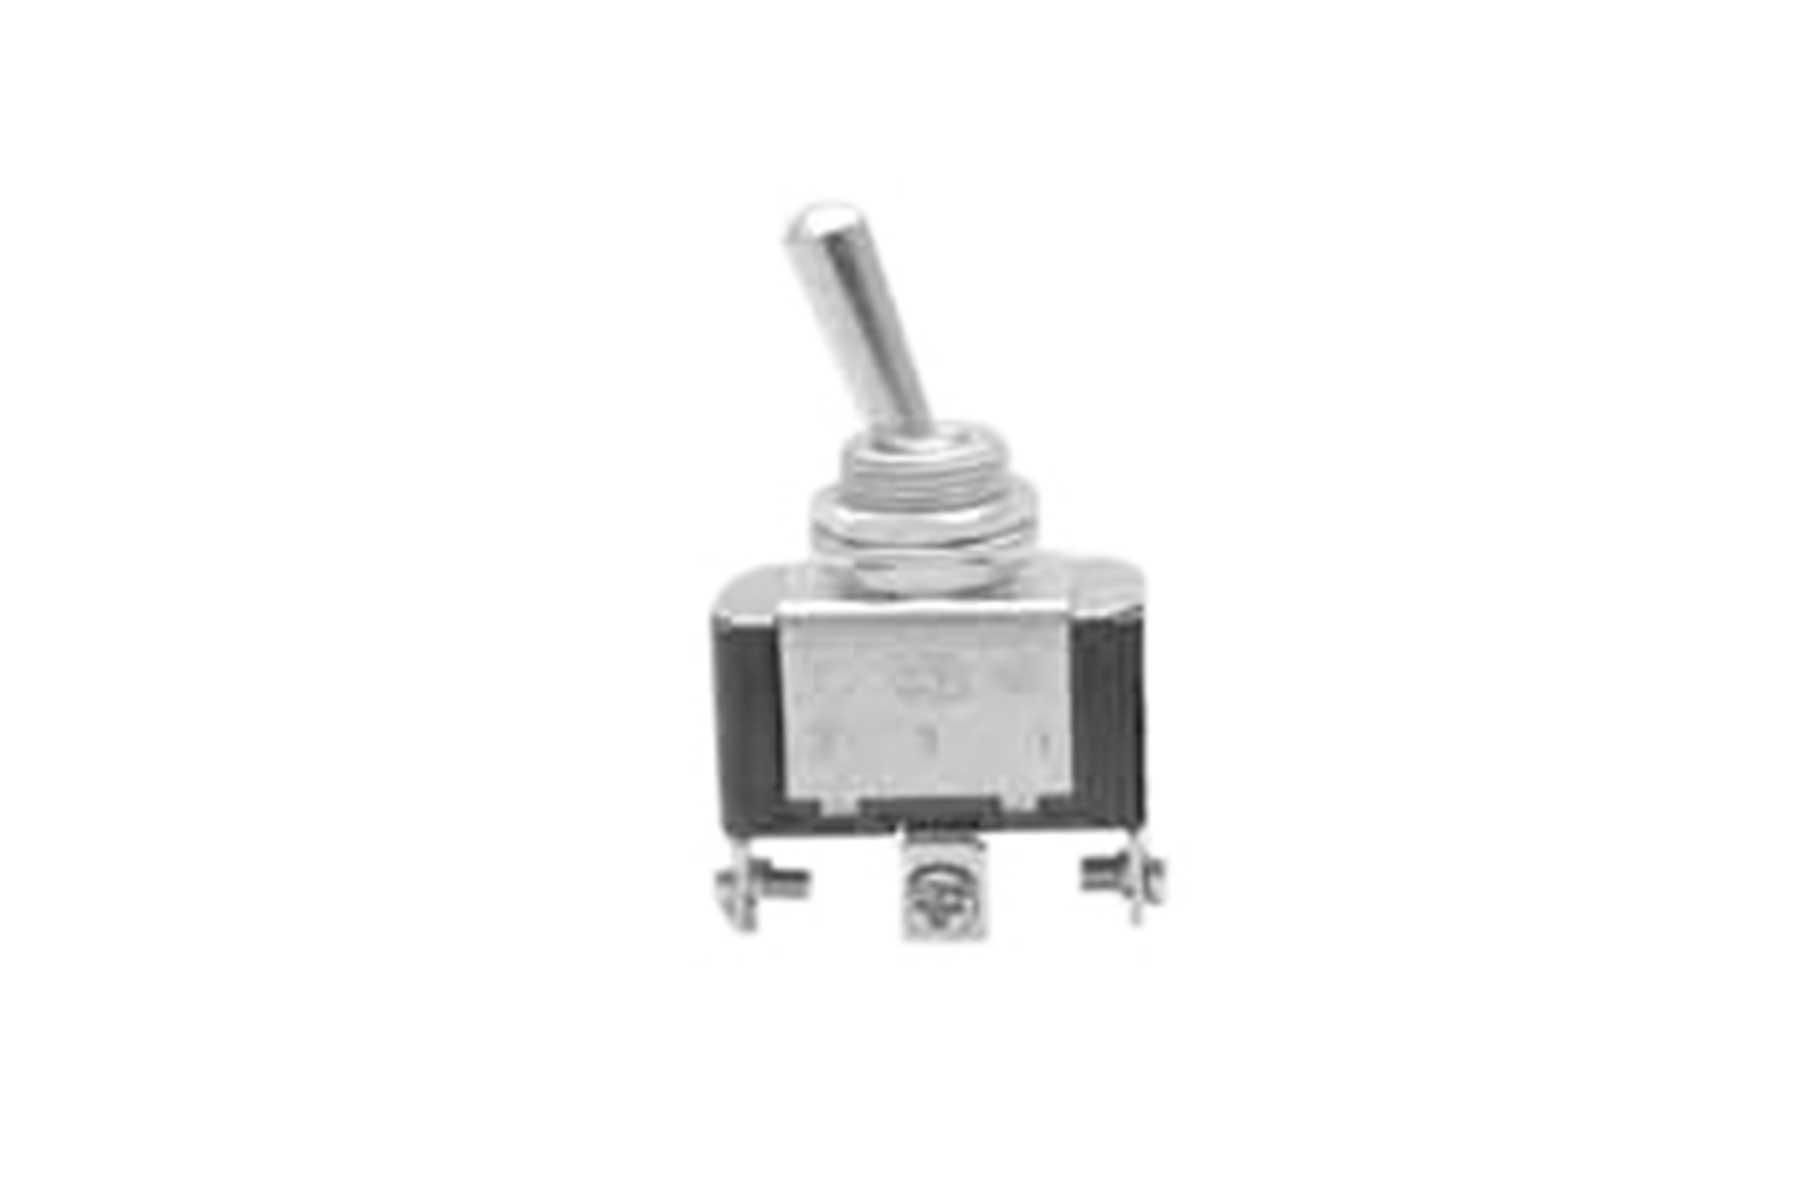 SPST Toggle Lamp Switch